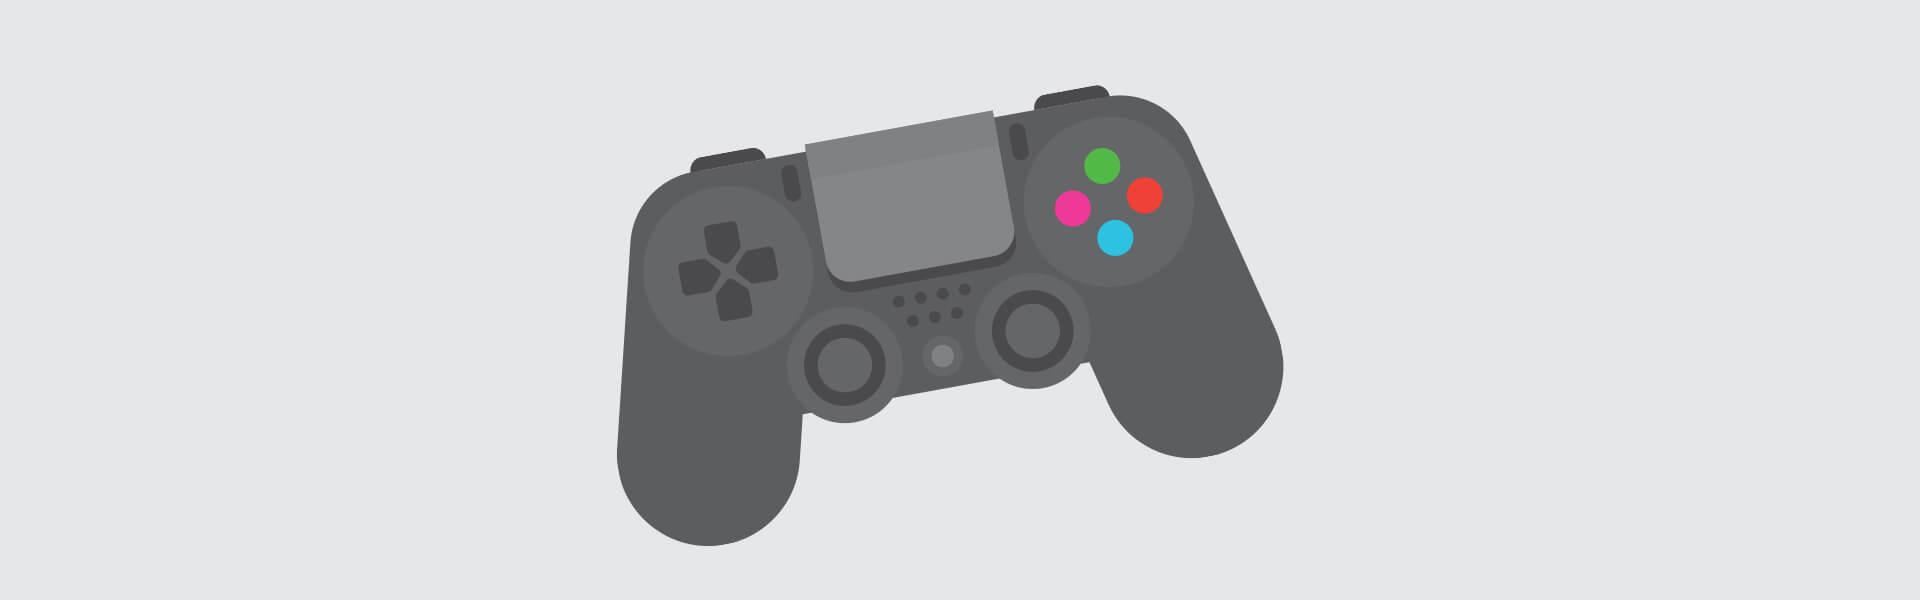 PlayStation Dualshock 4 Controller | Dave McLean